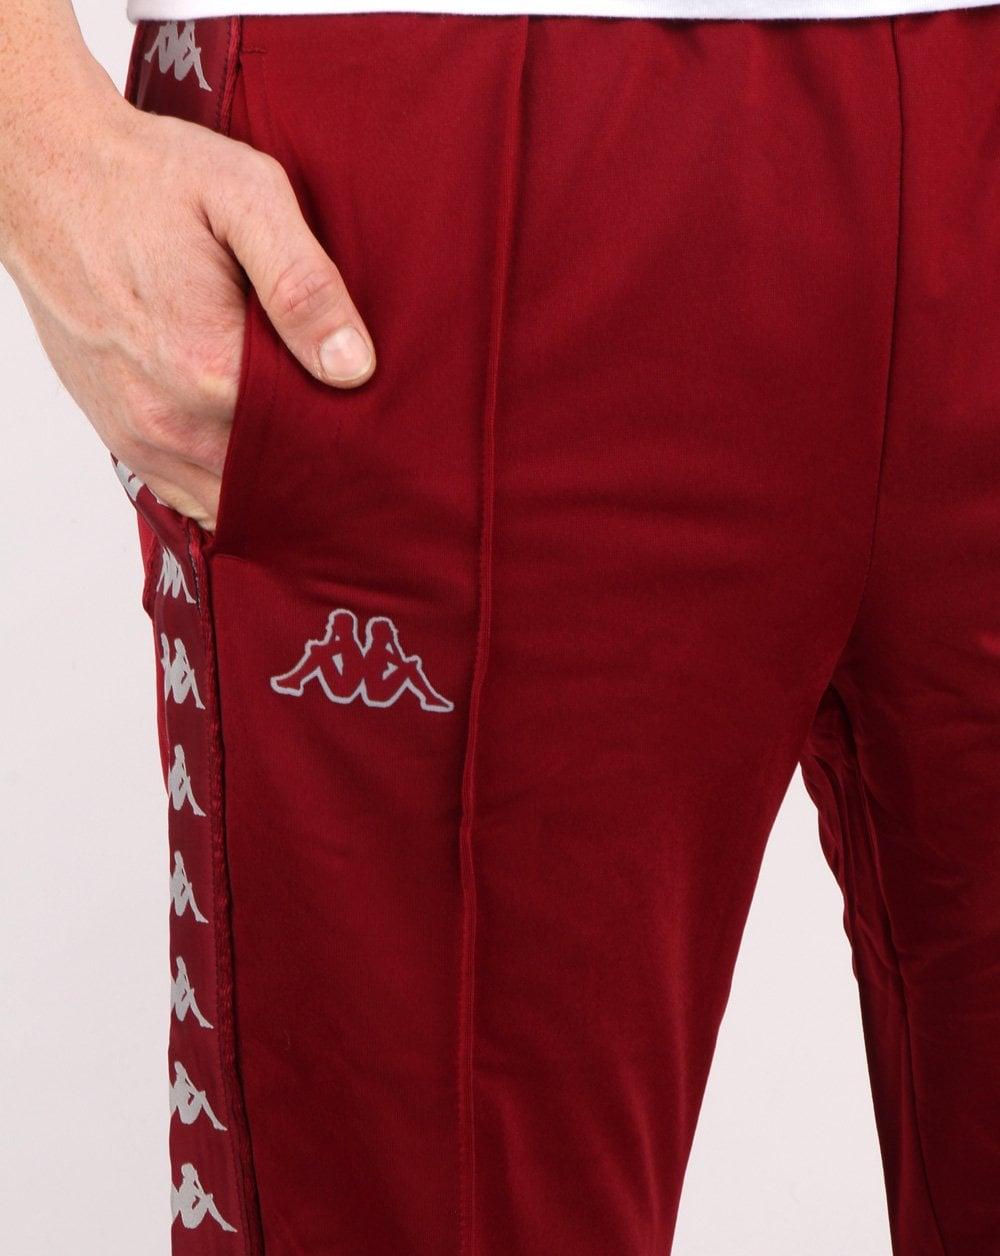 a7977f9a6763 Kappa Banda Astoria Slim Pant Burgundy